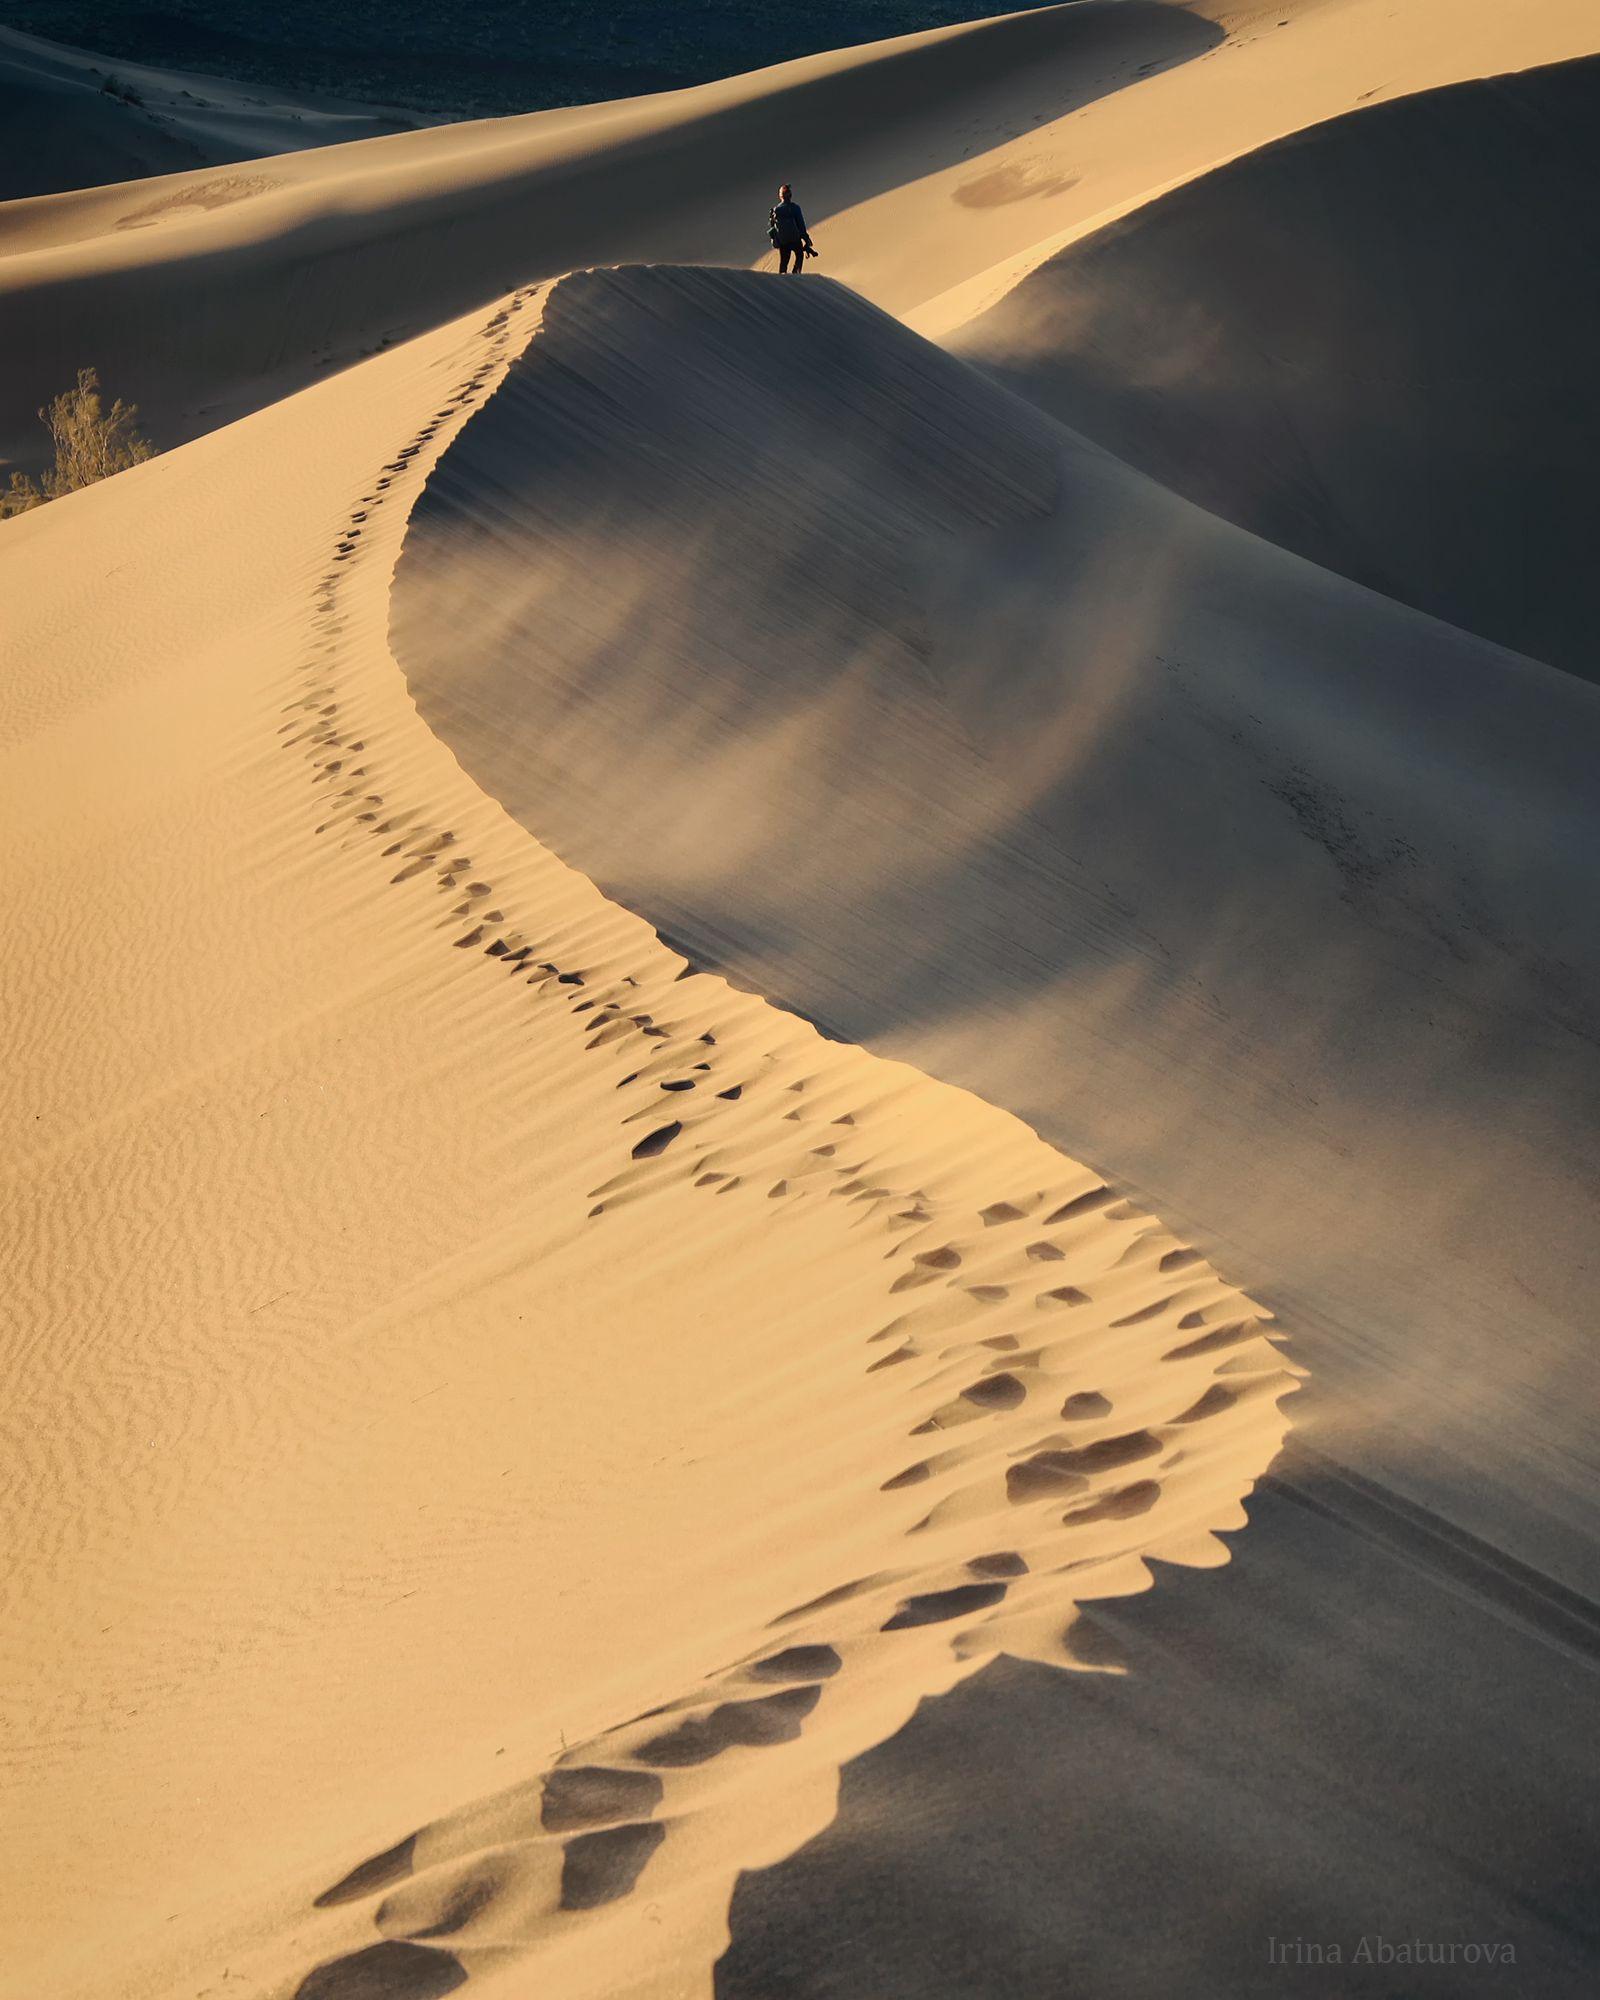 алтын-эмель, поющий бархан, казахстан, дюна, бархан, пустыня, Абатурова Ирина